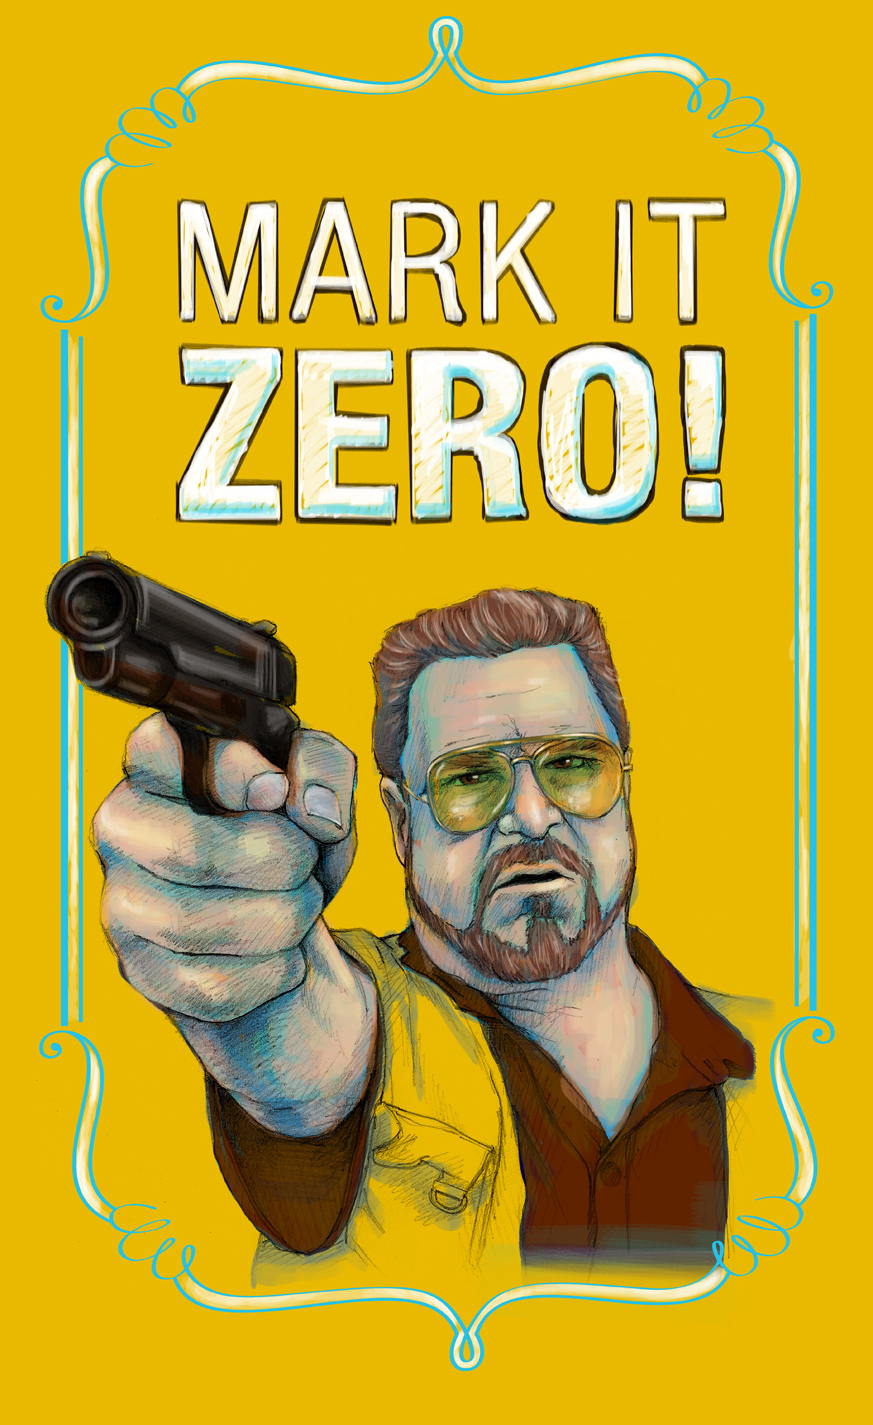 Walter_Zero_web.jpg